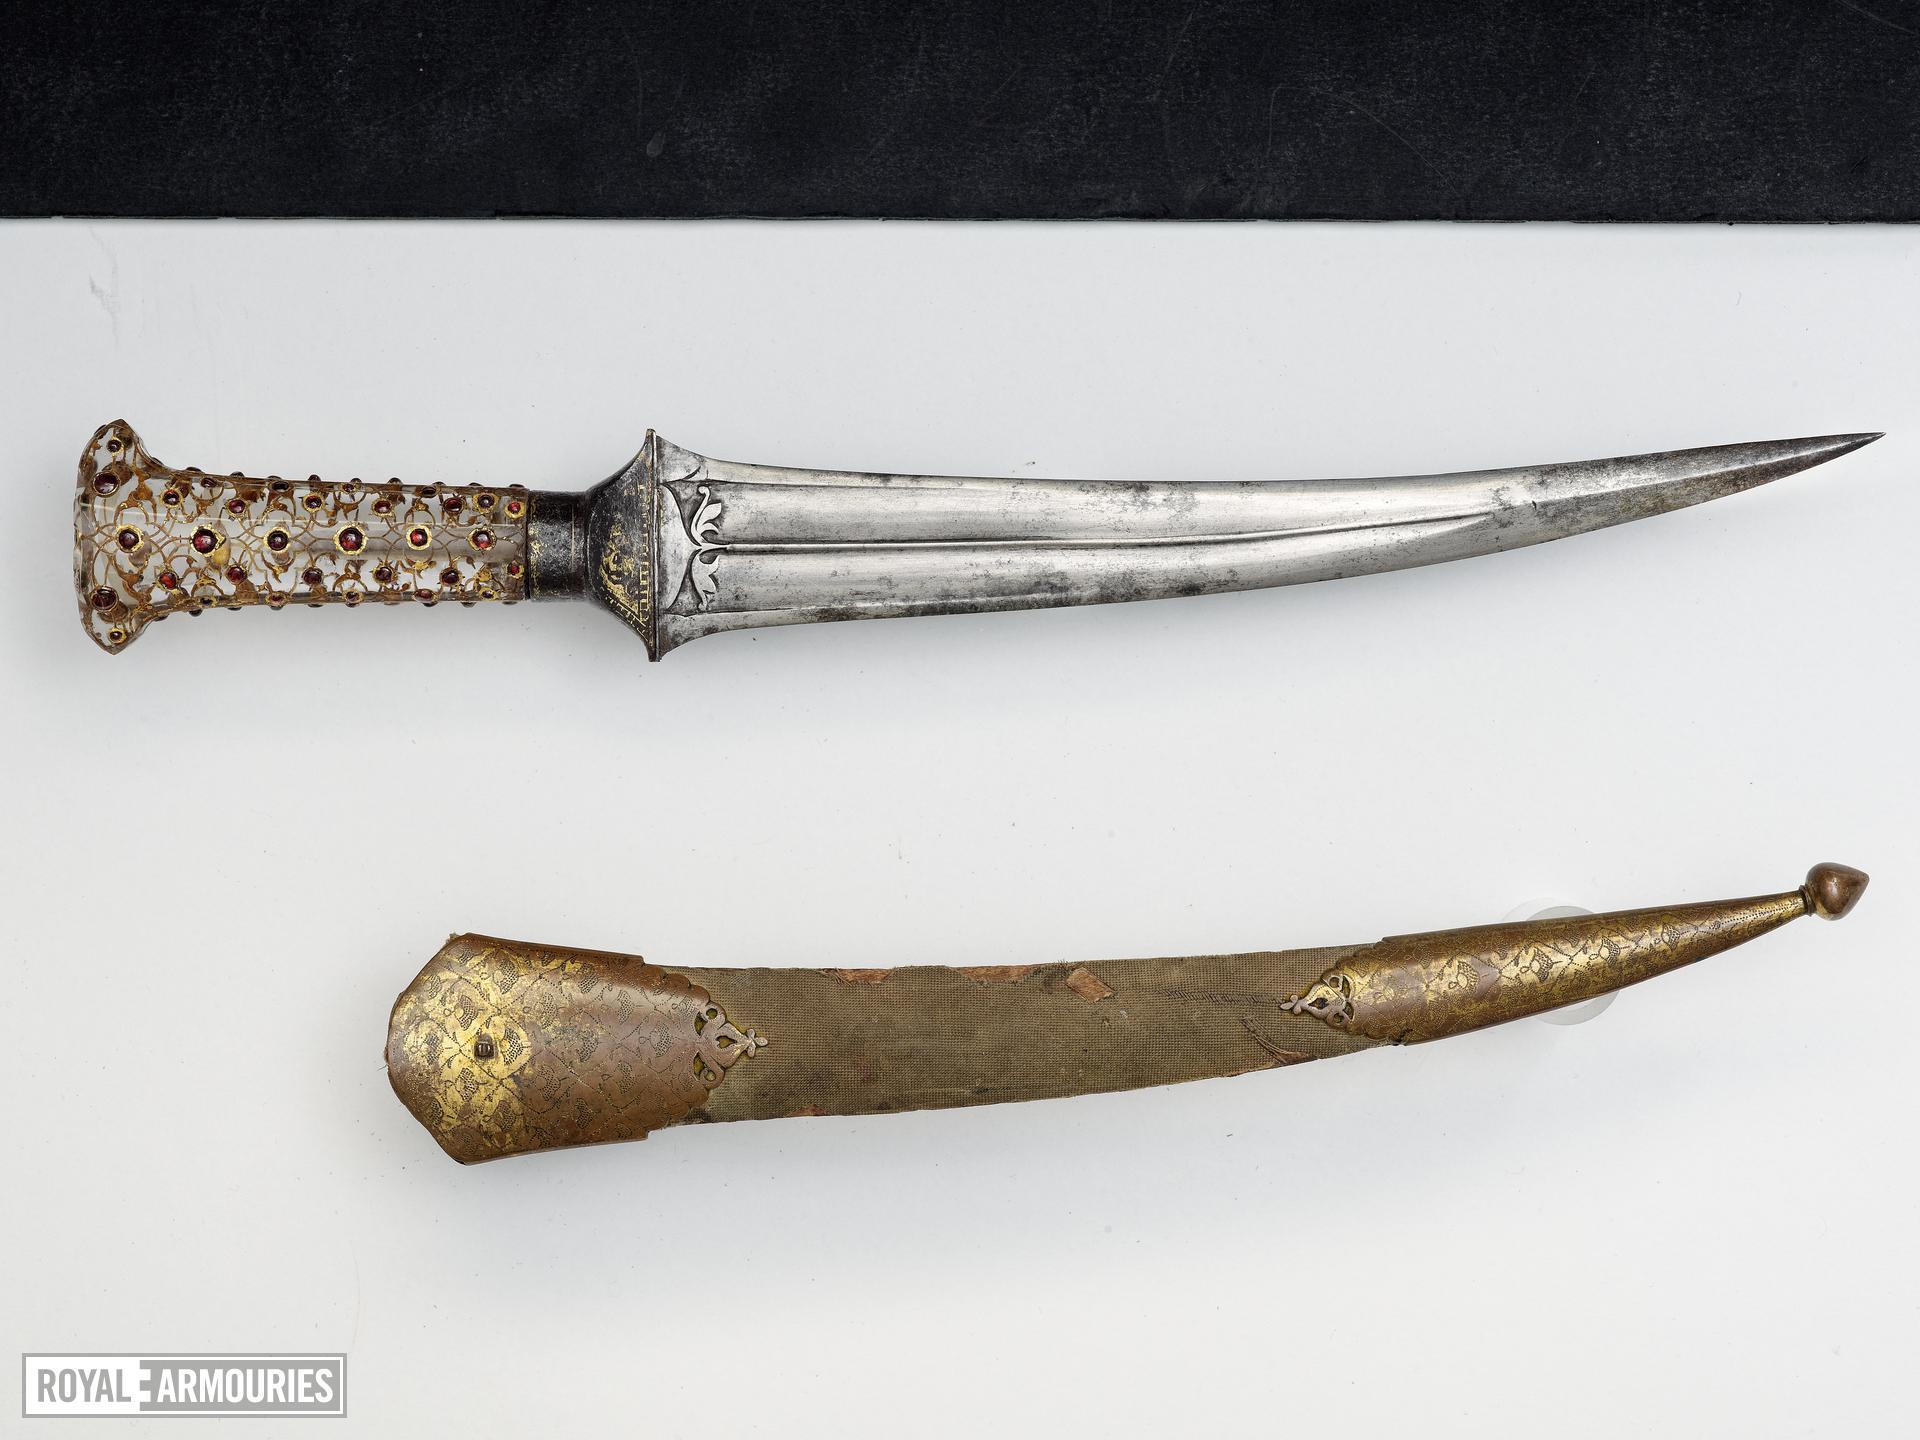 Dagger (khanjar) and scabbard